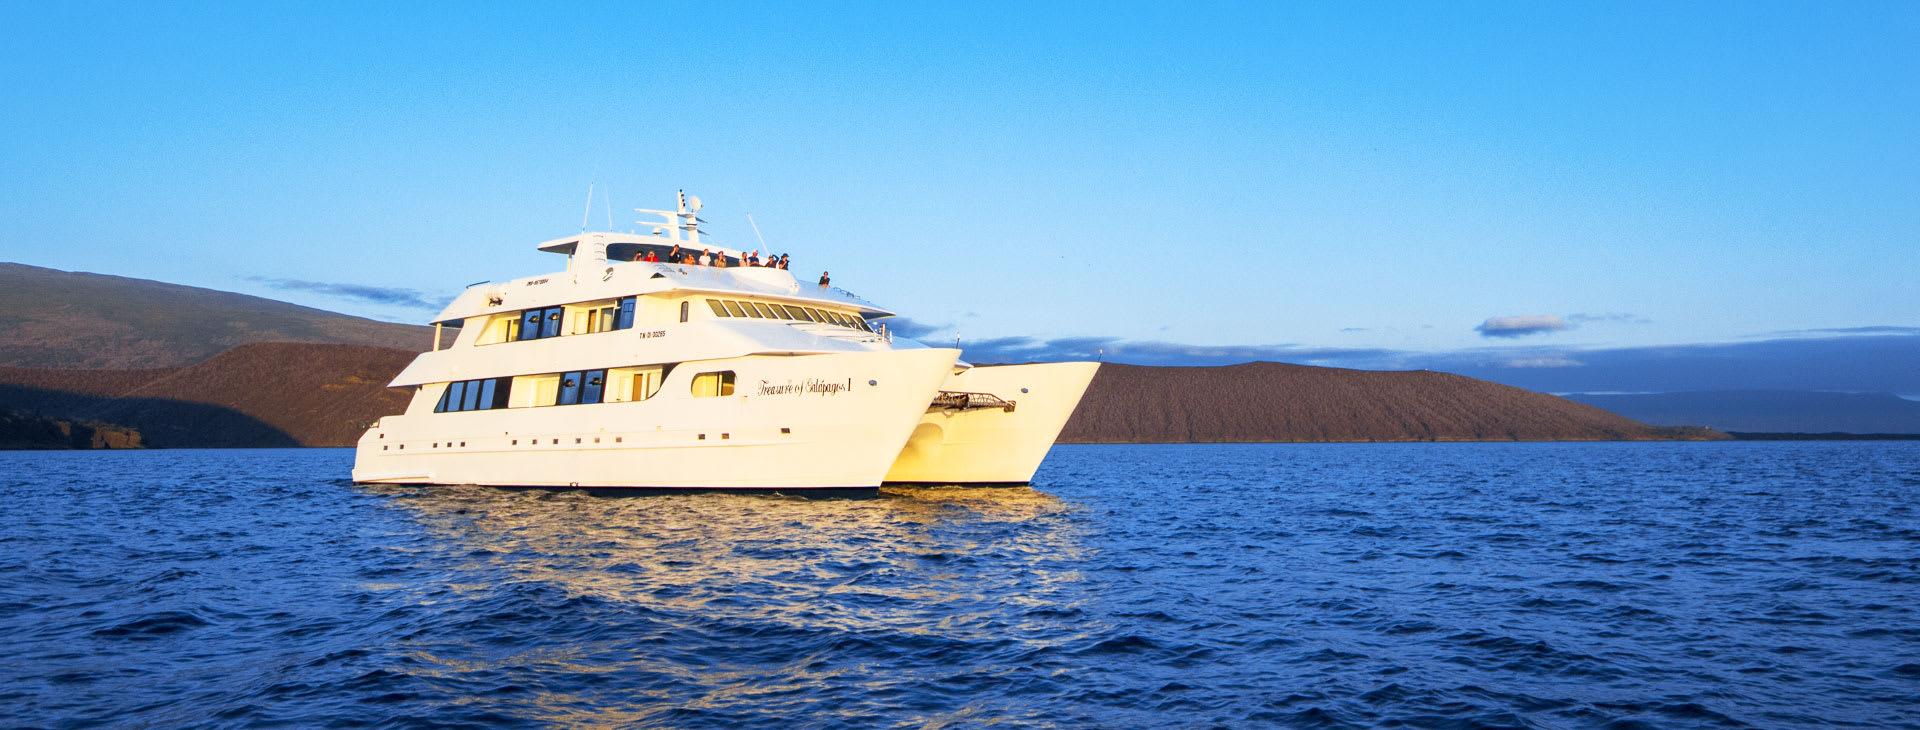 Beautiful boat at sea